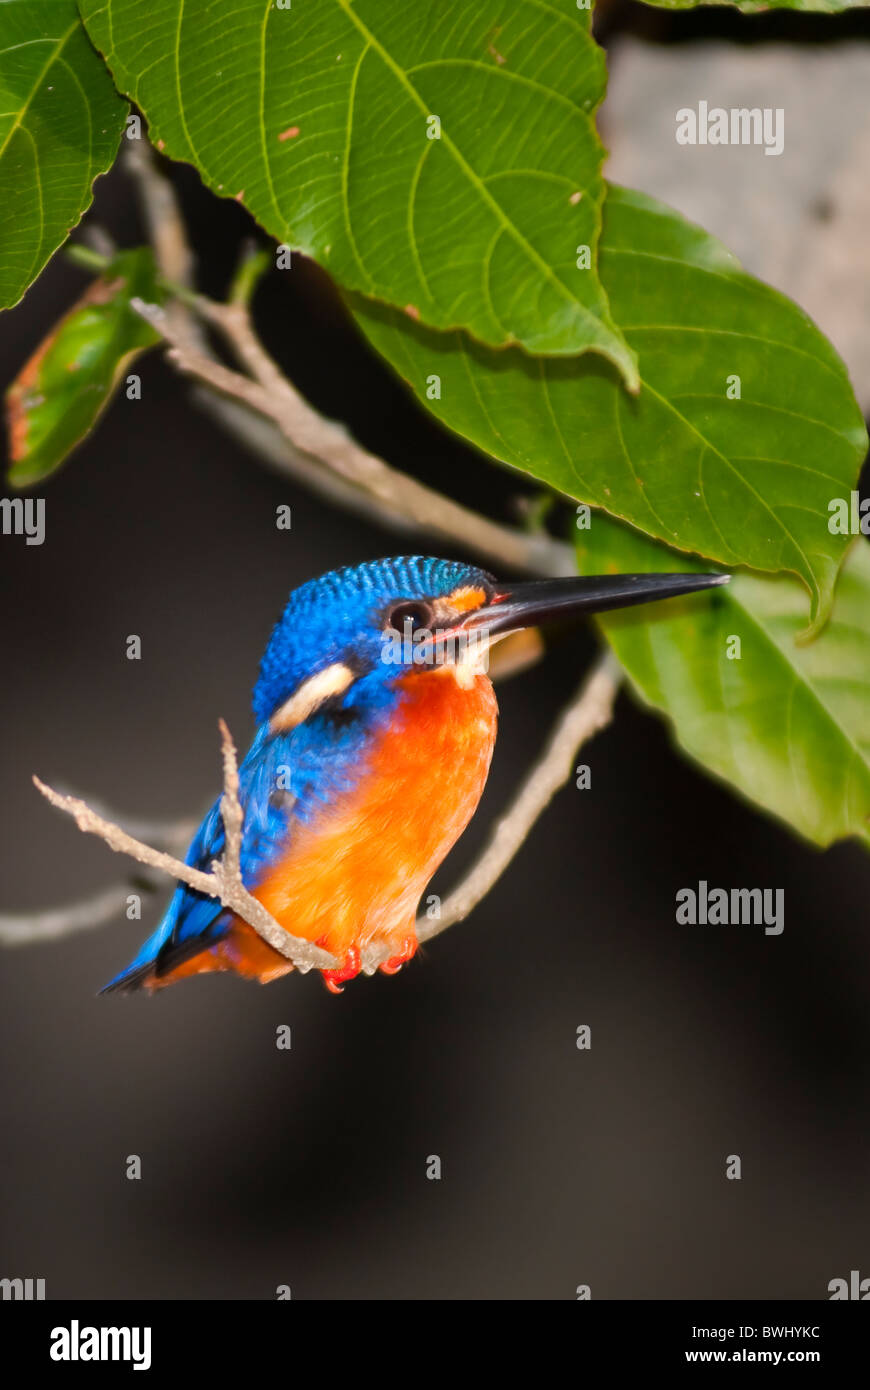 Tiny Kingfisher bird grabbing on a tree branch on Sungai Kinabatangan's bank in Sabah, Borneo, Malaysia - Stock Image